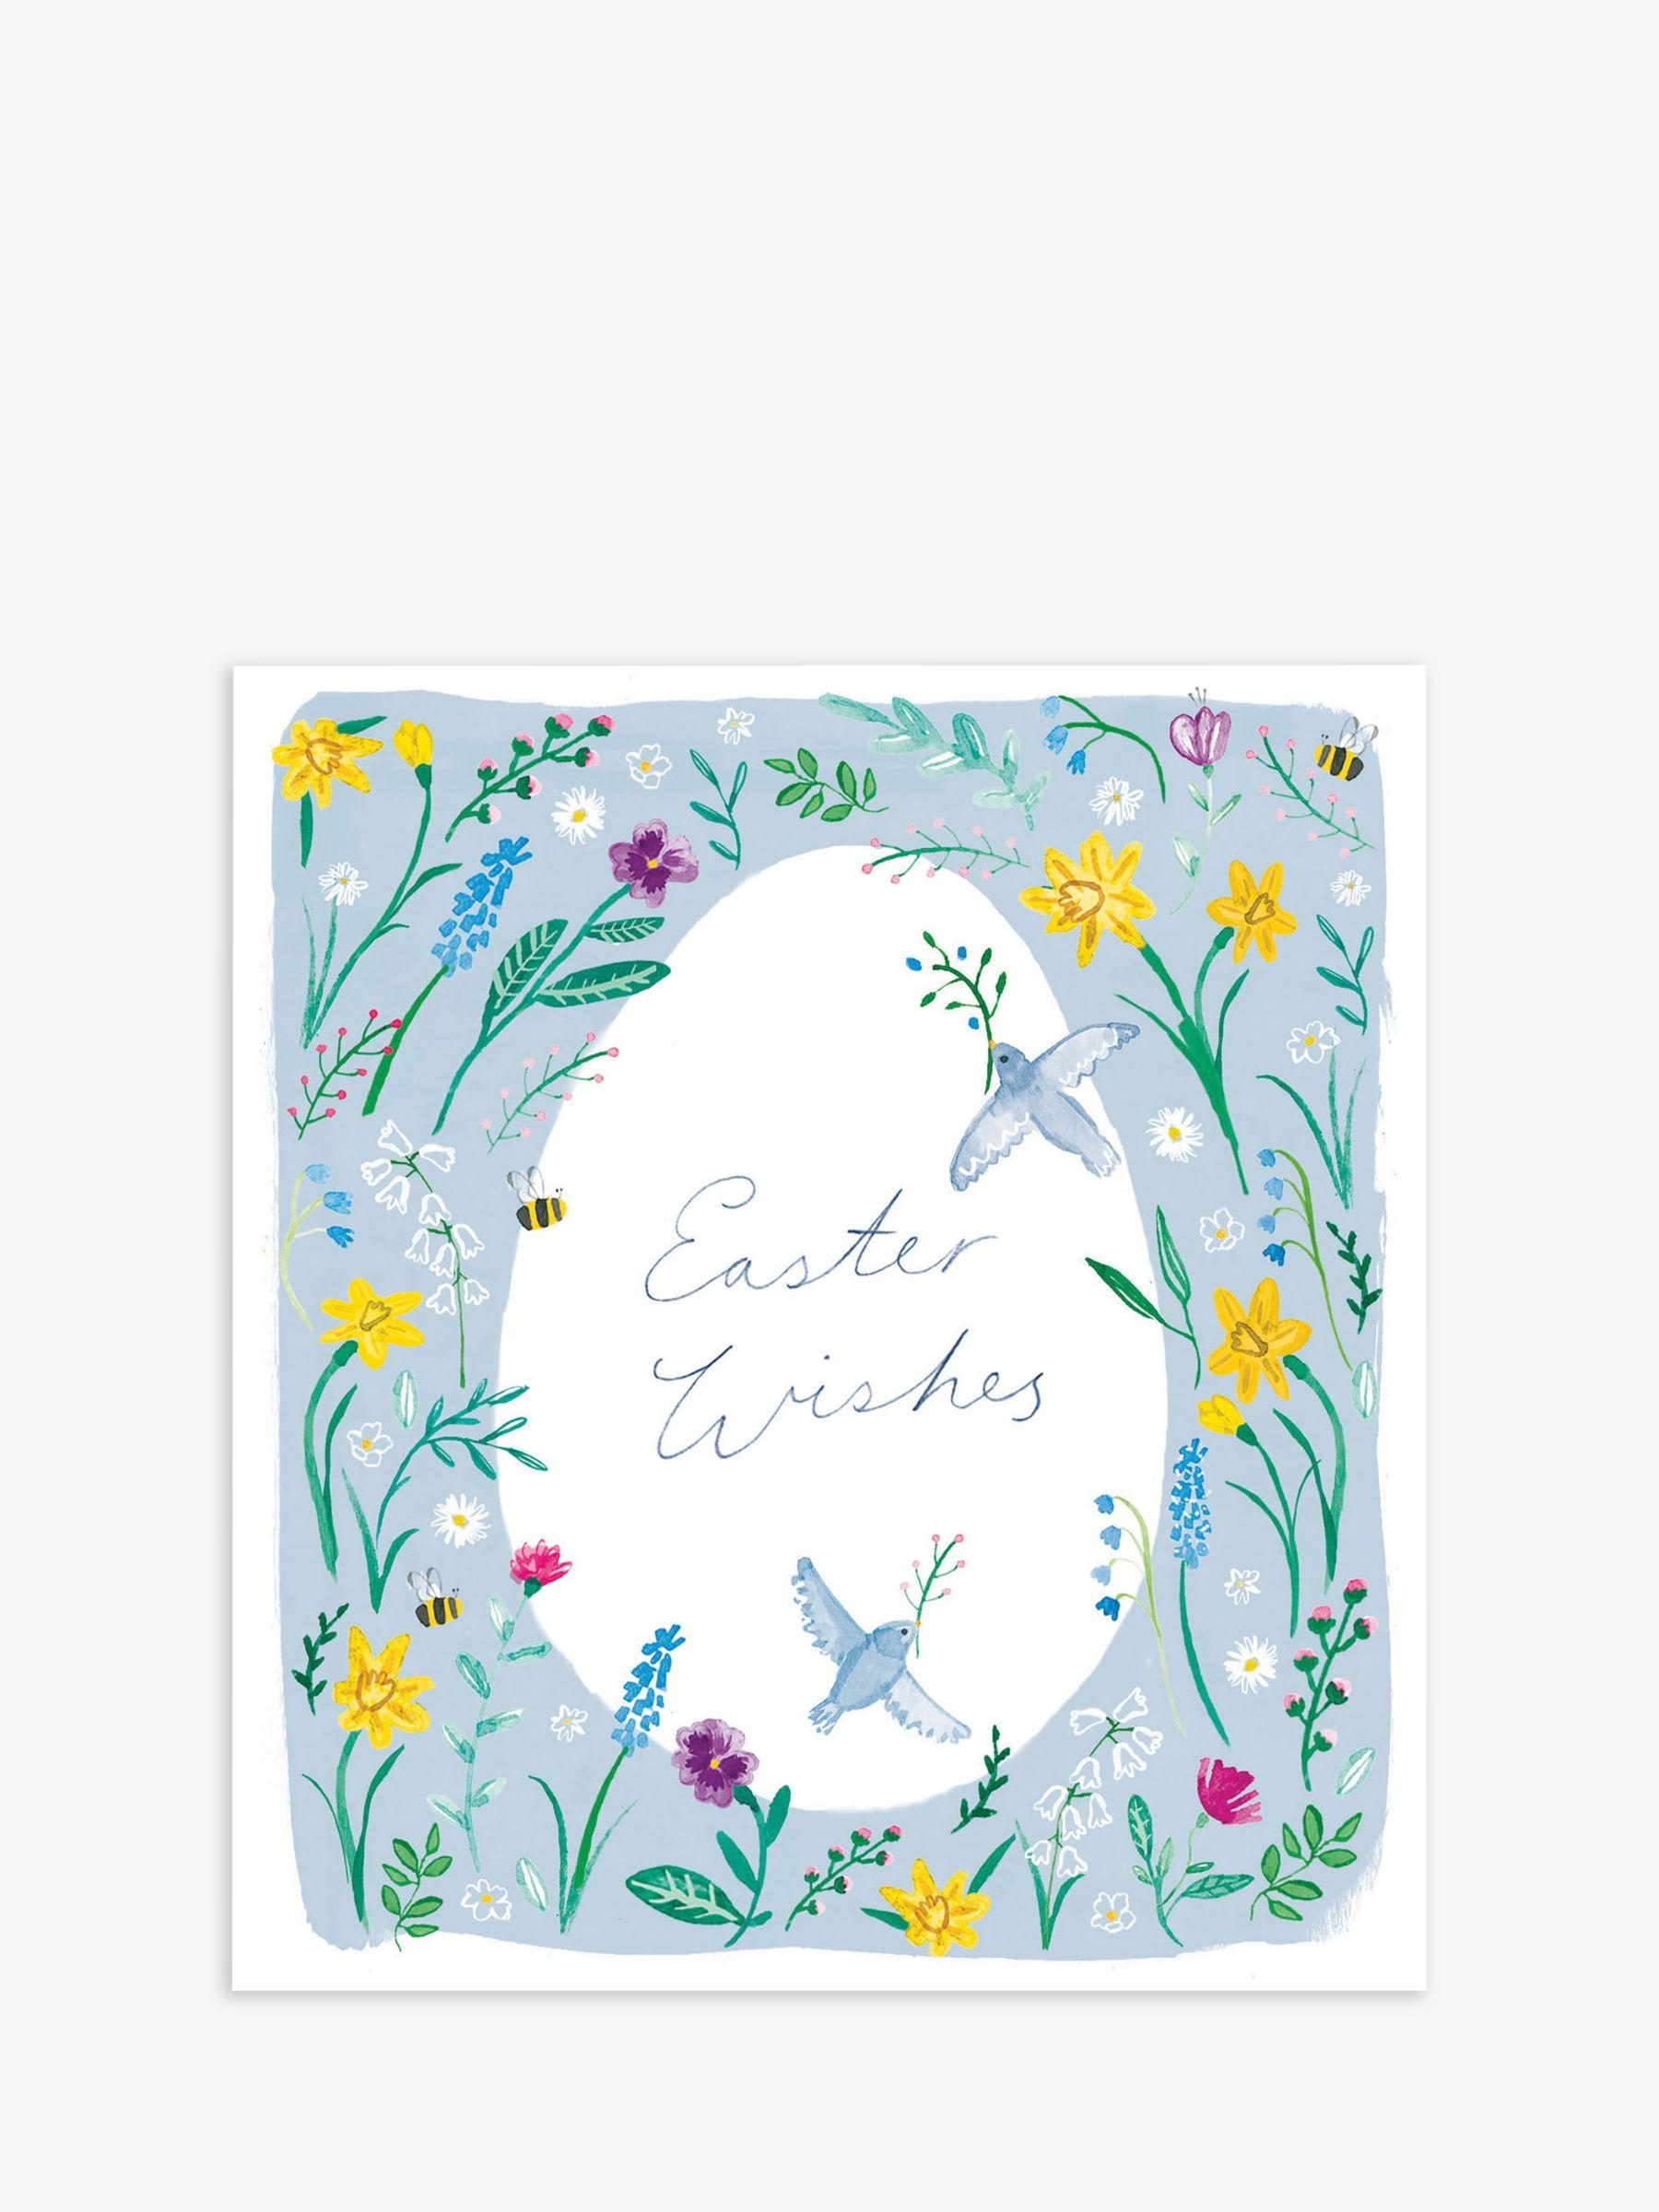 Cardmix Cardmix Birds Easter Cards, Pack of 5